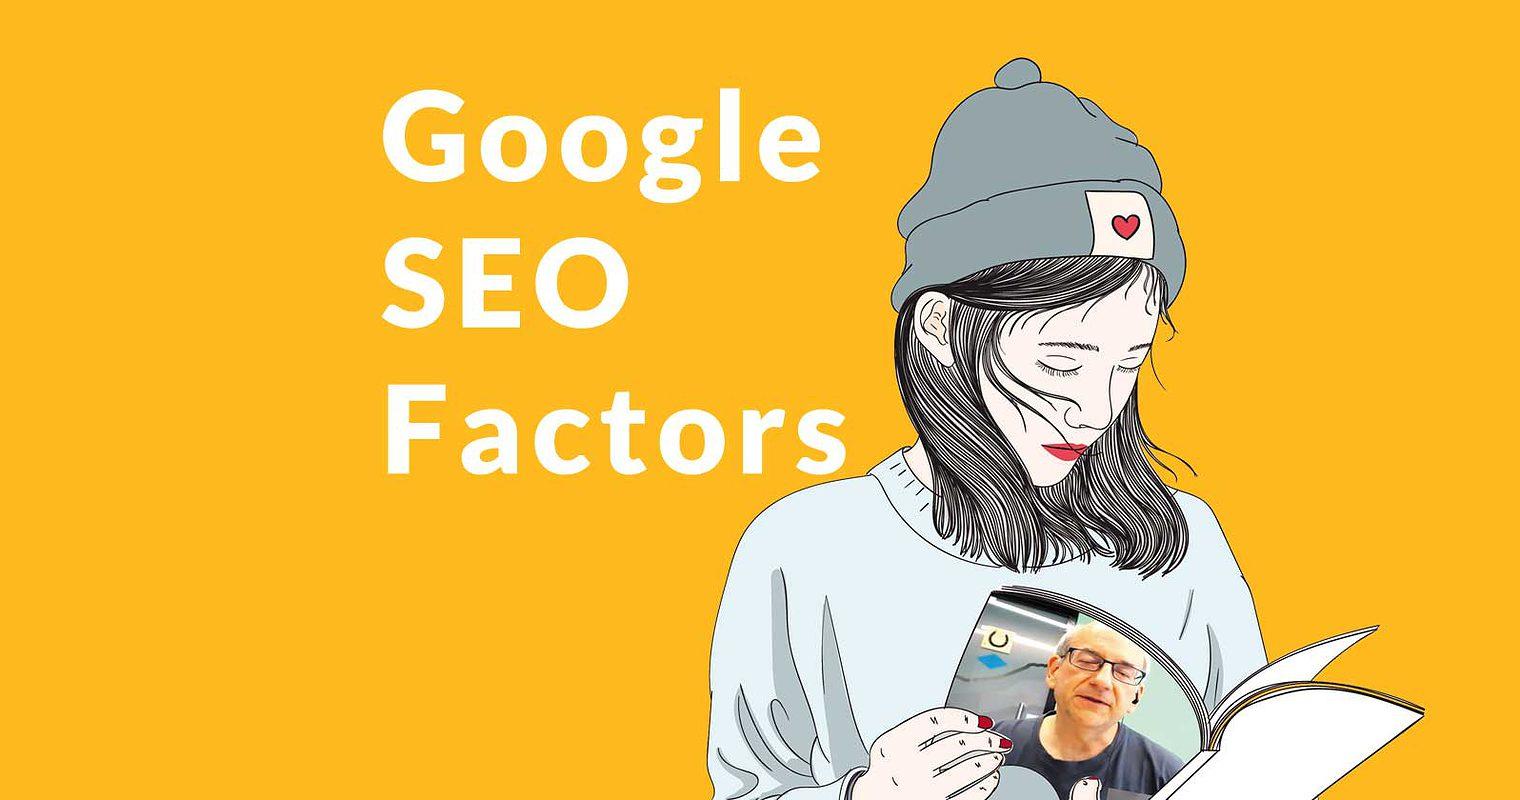 Google's John Mueller is Asked About Top 3 SEO Factors